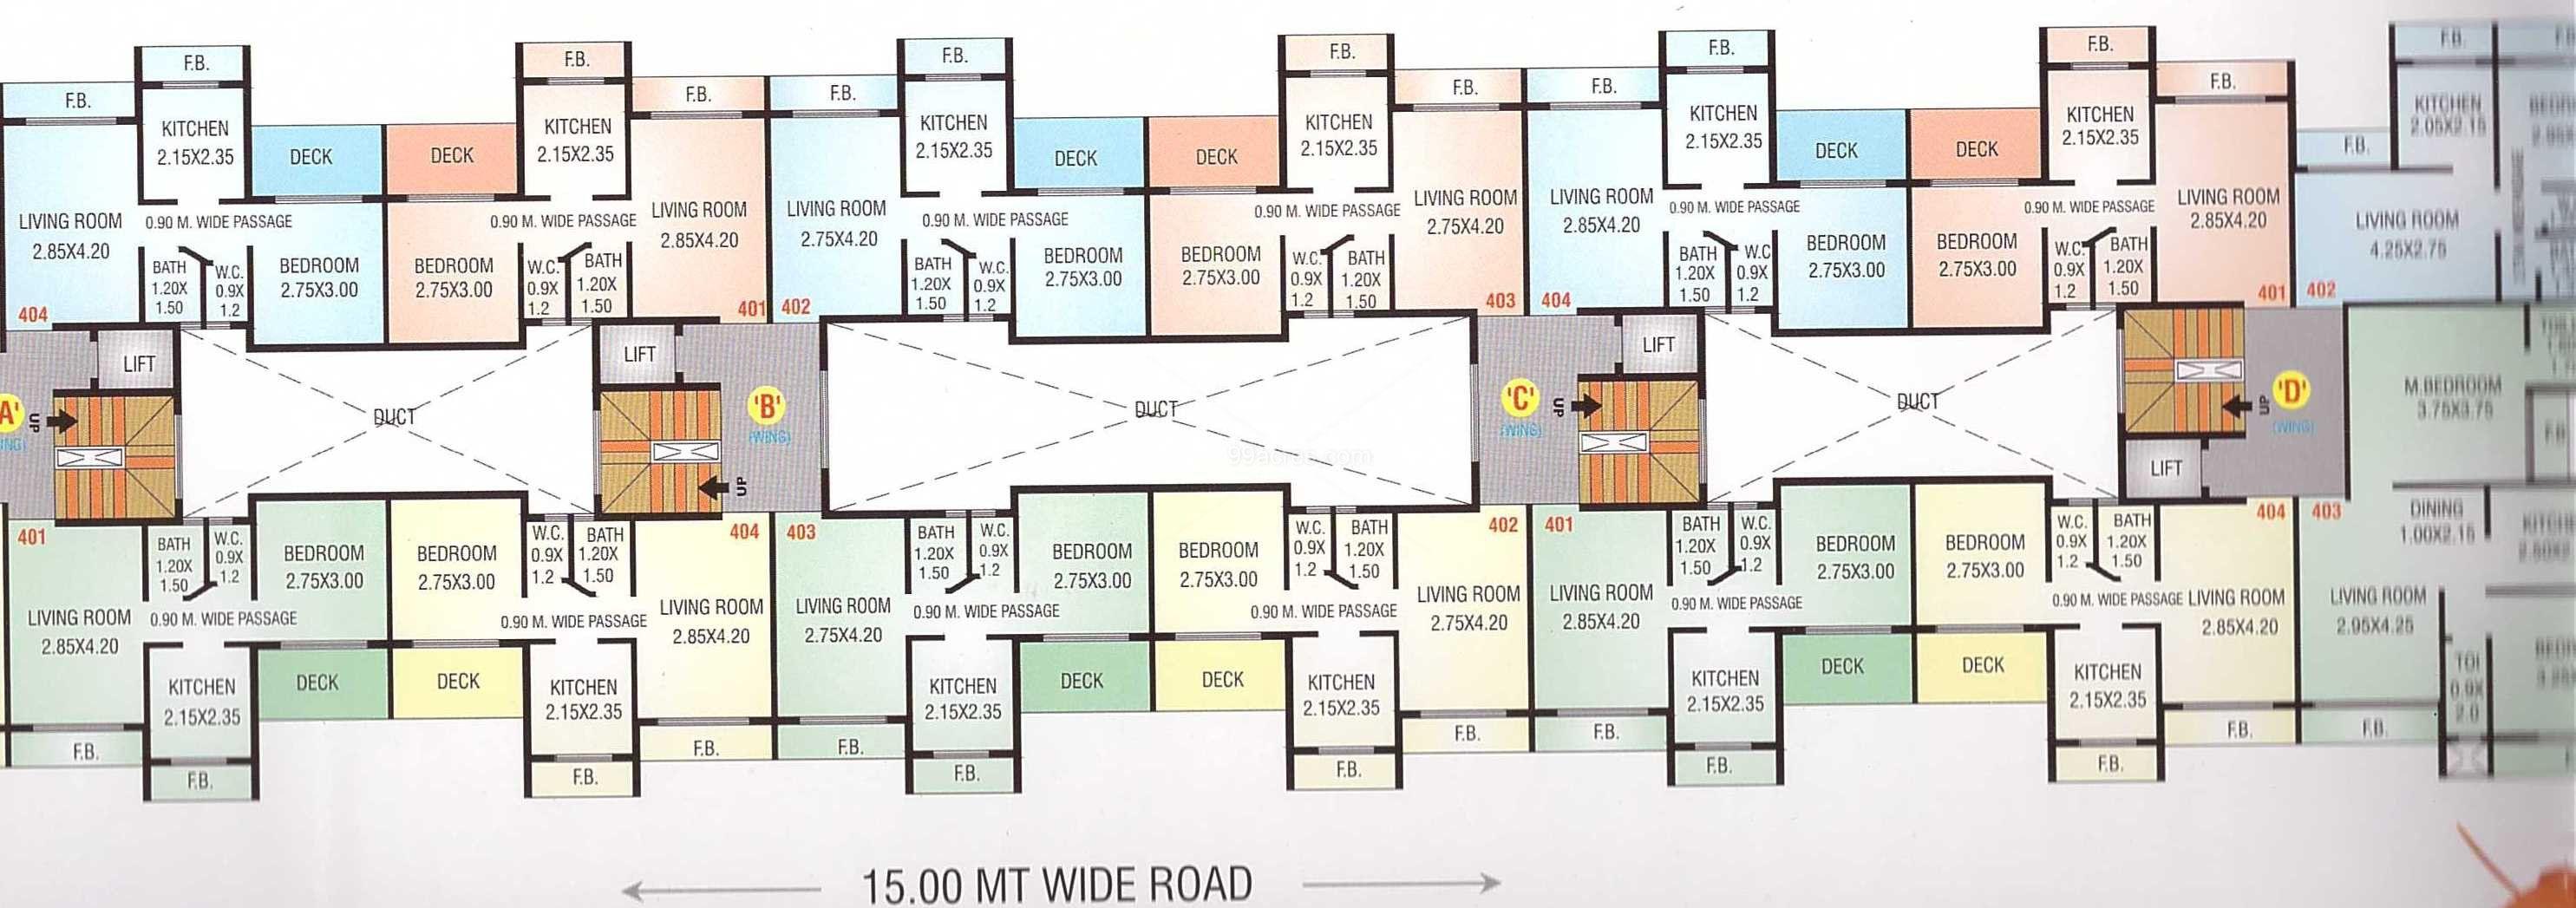 Apartment Complex Floor Plans Laxmi Group Plan Taloja Petadunia Info Floor Plans Apartment Complexes How To Plan